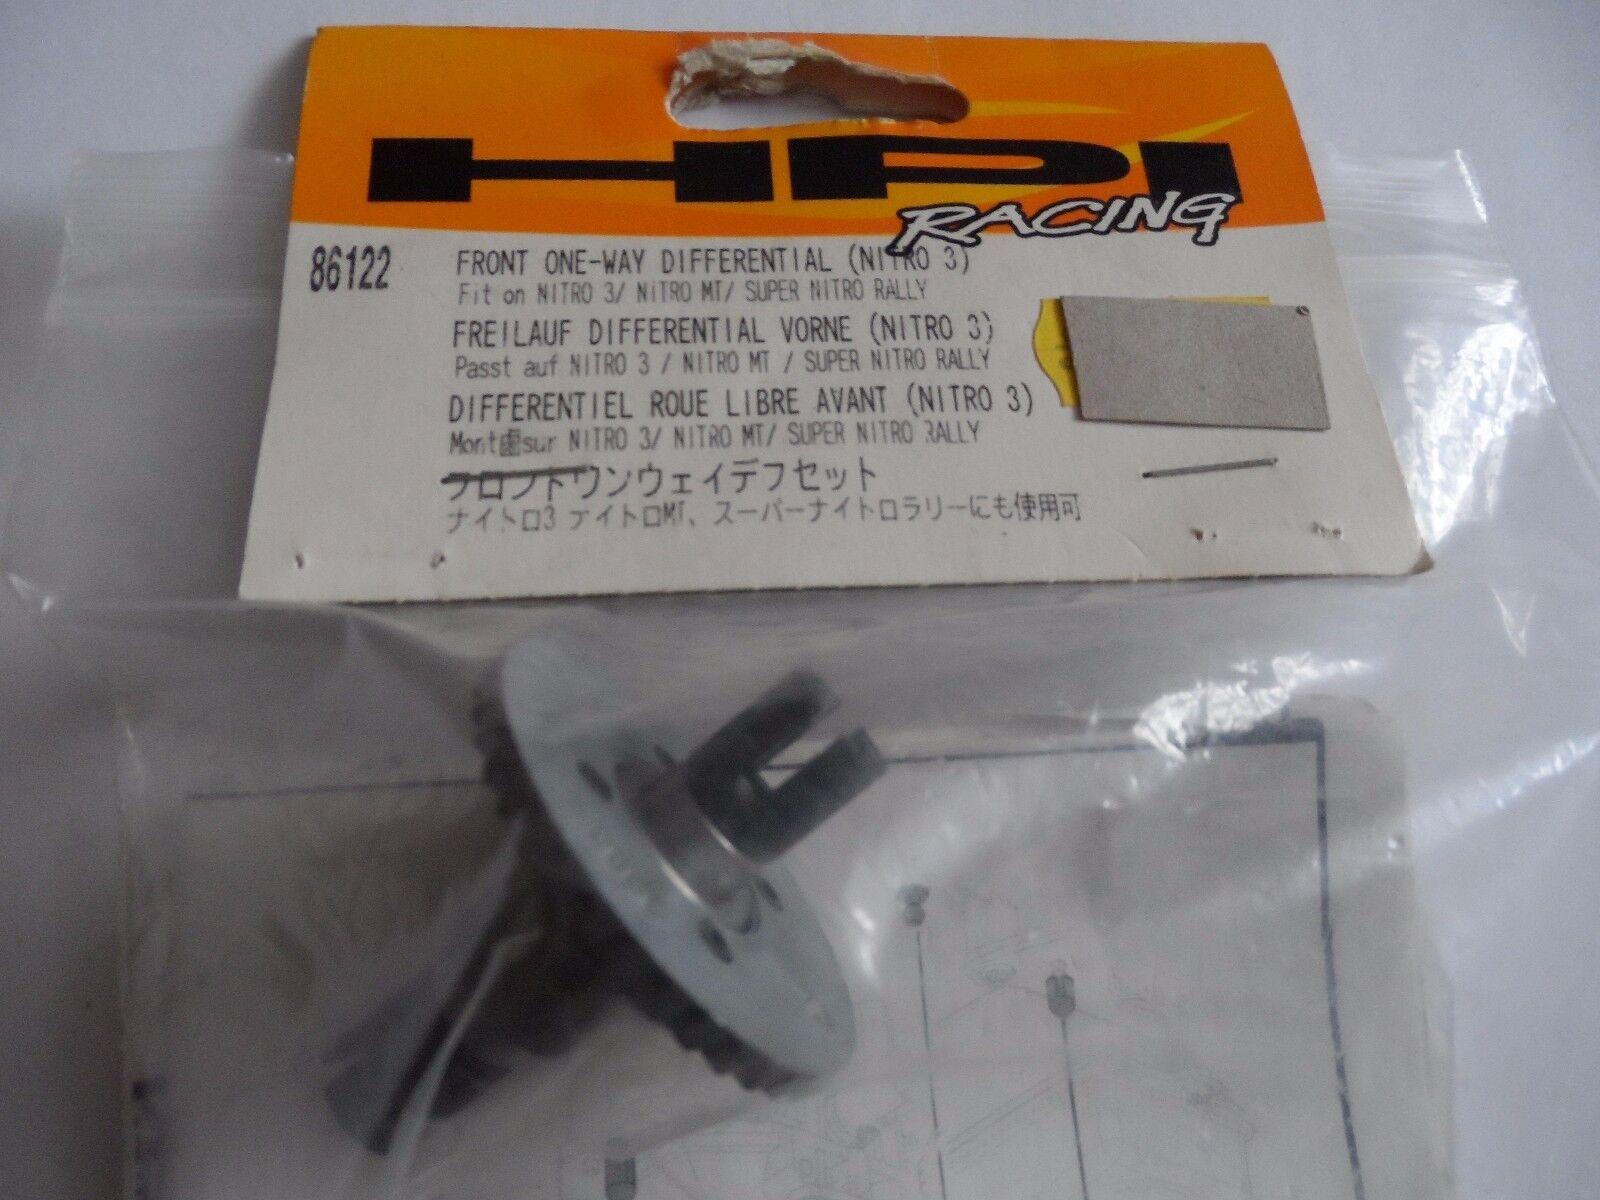 Rare HPI Front One-Way Differential Unit For Nitro 3 MT Super Nitro Rally 86122